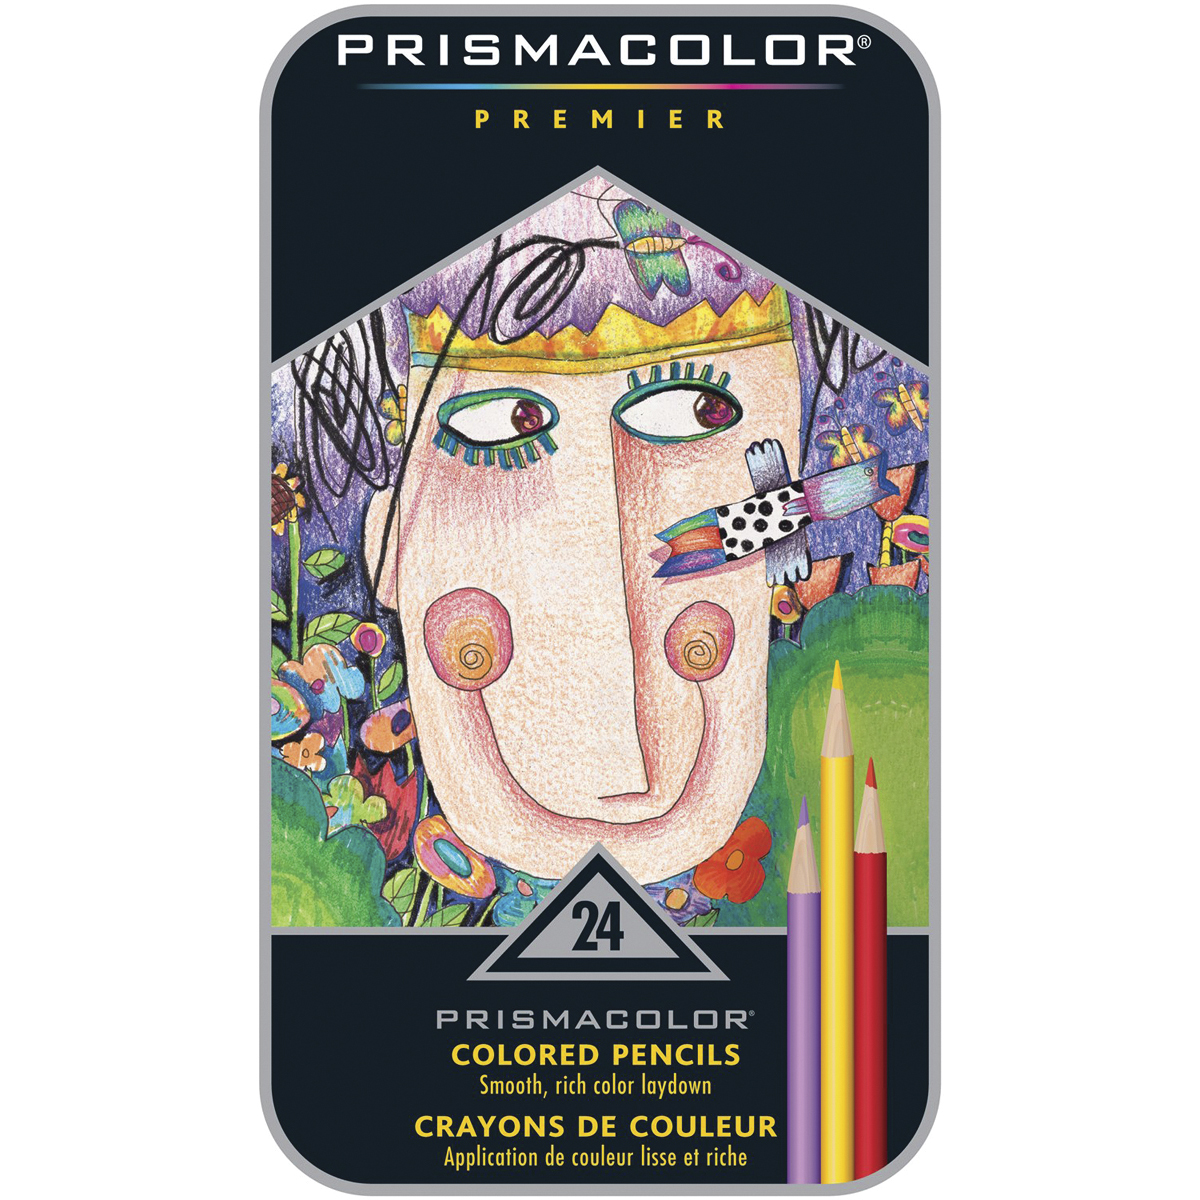 Prismacolor Premier Colored Pencils 24 Count Walmart